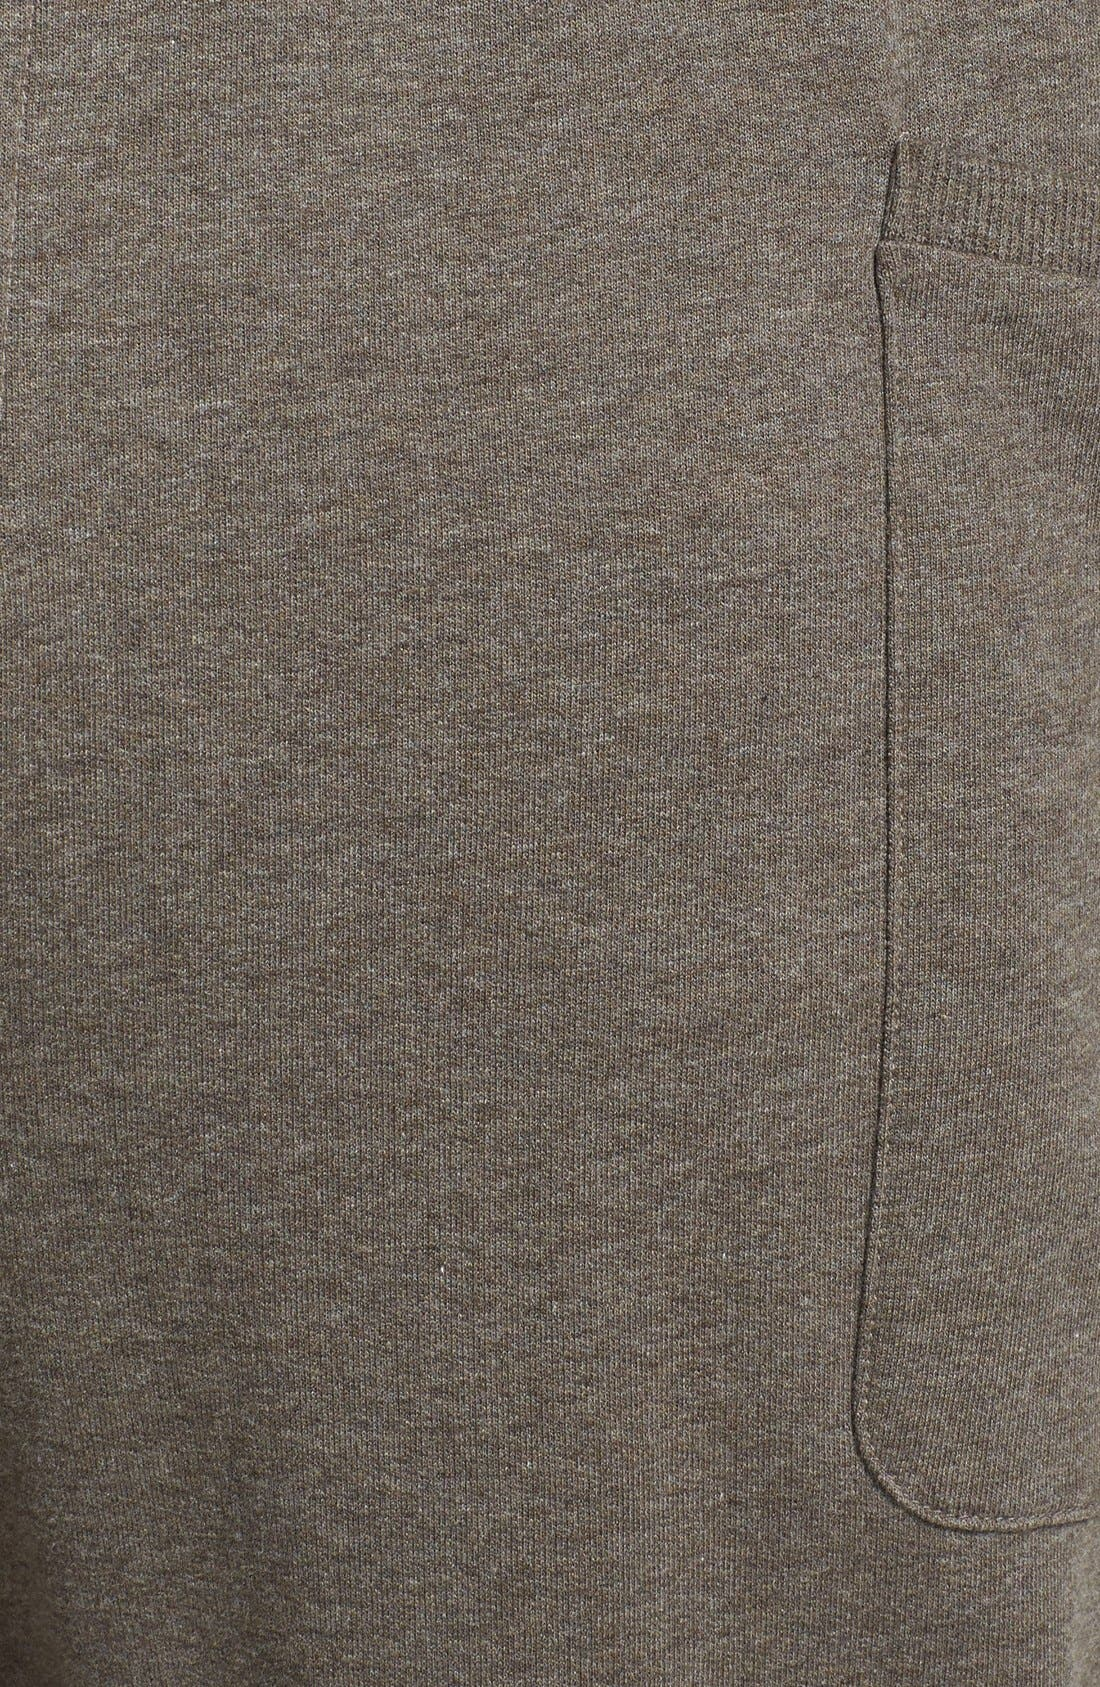 Alternate Image 3  - BOSS HUGO BOSS 'Innovation 6' Lounge Pants